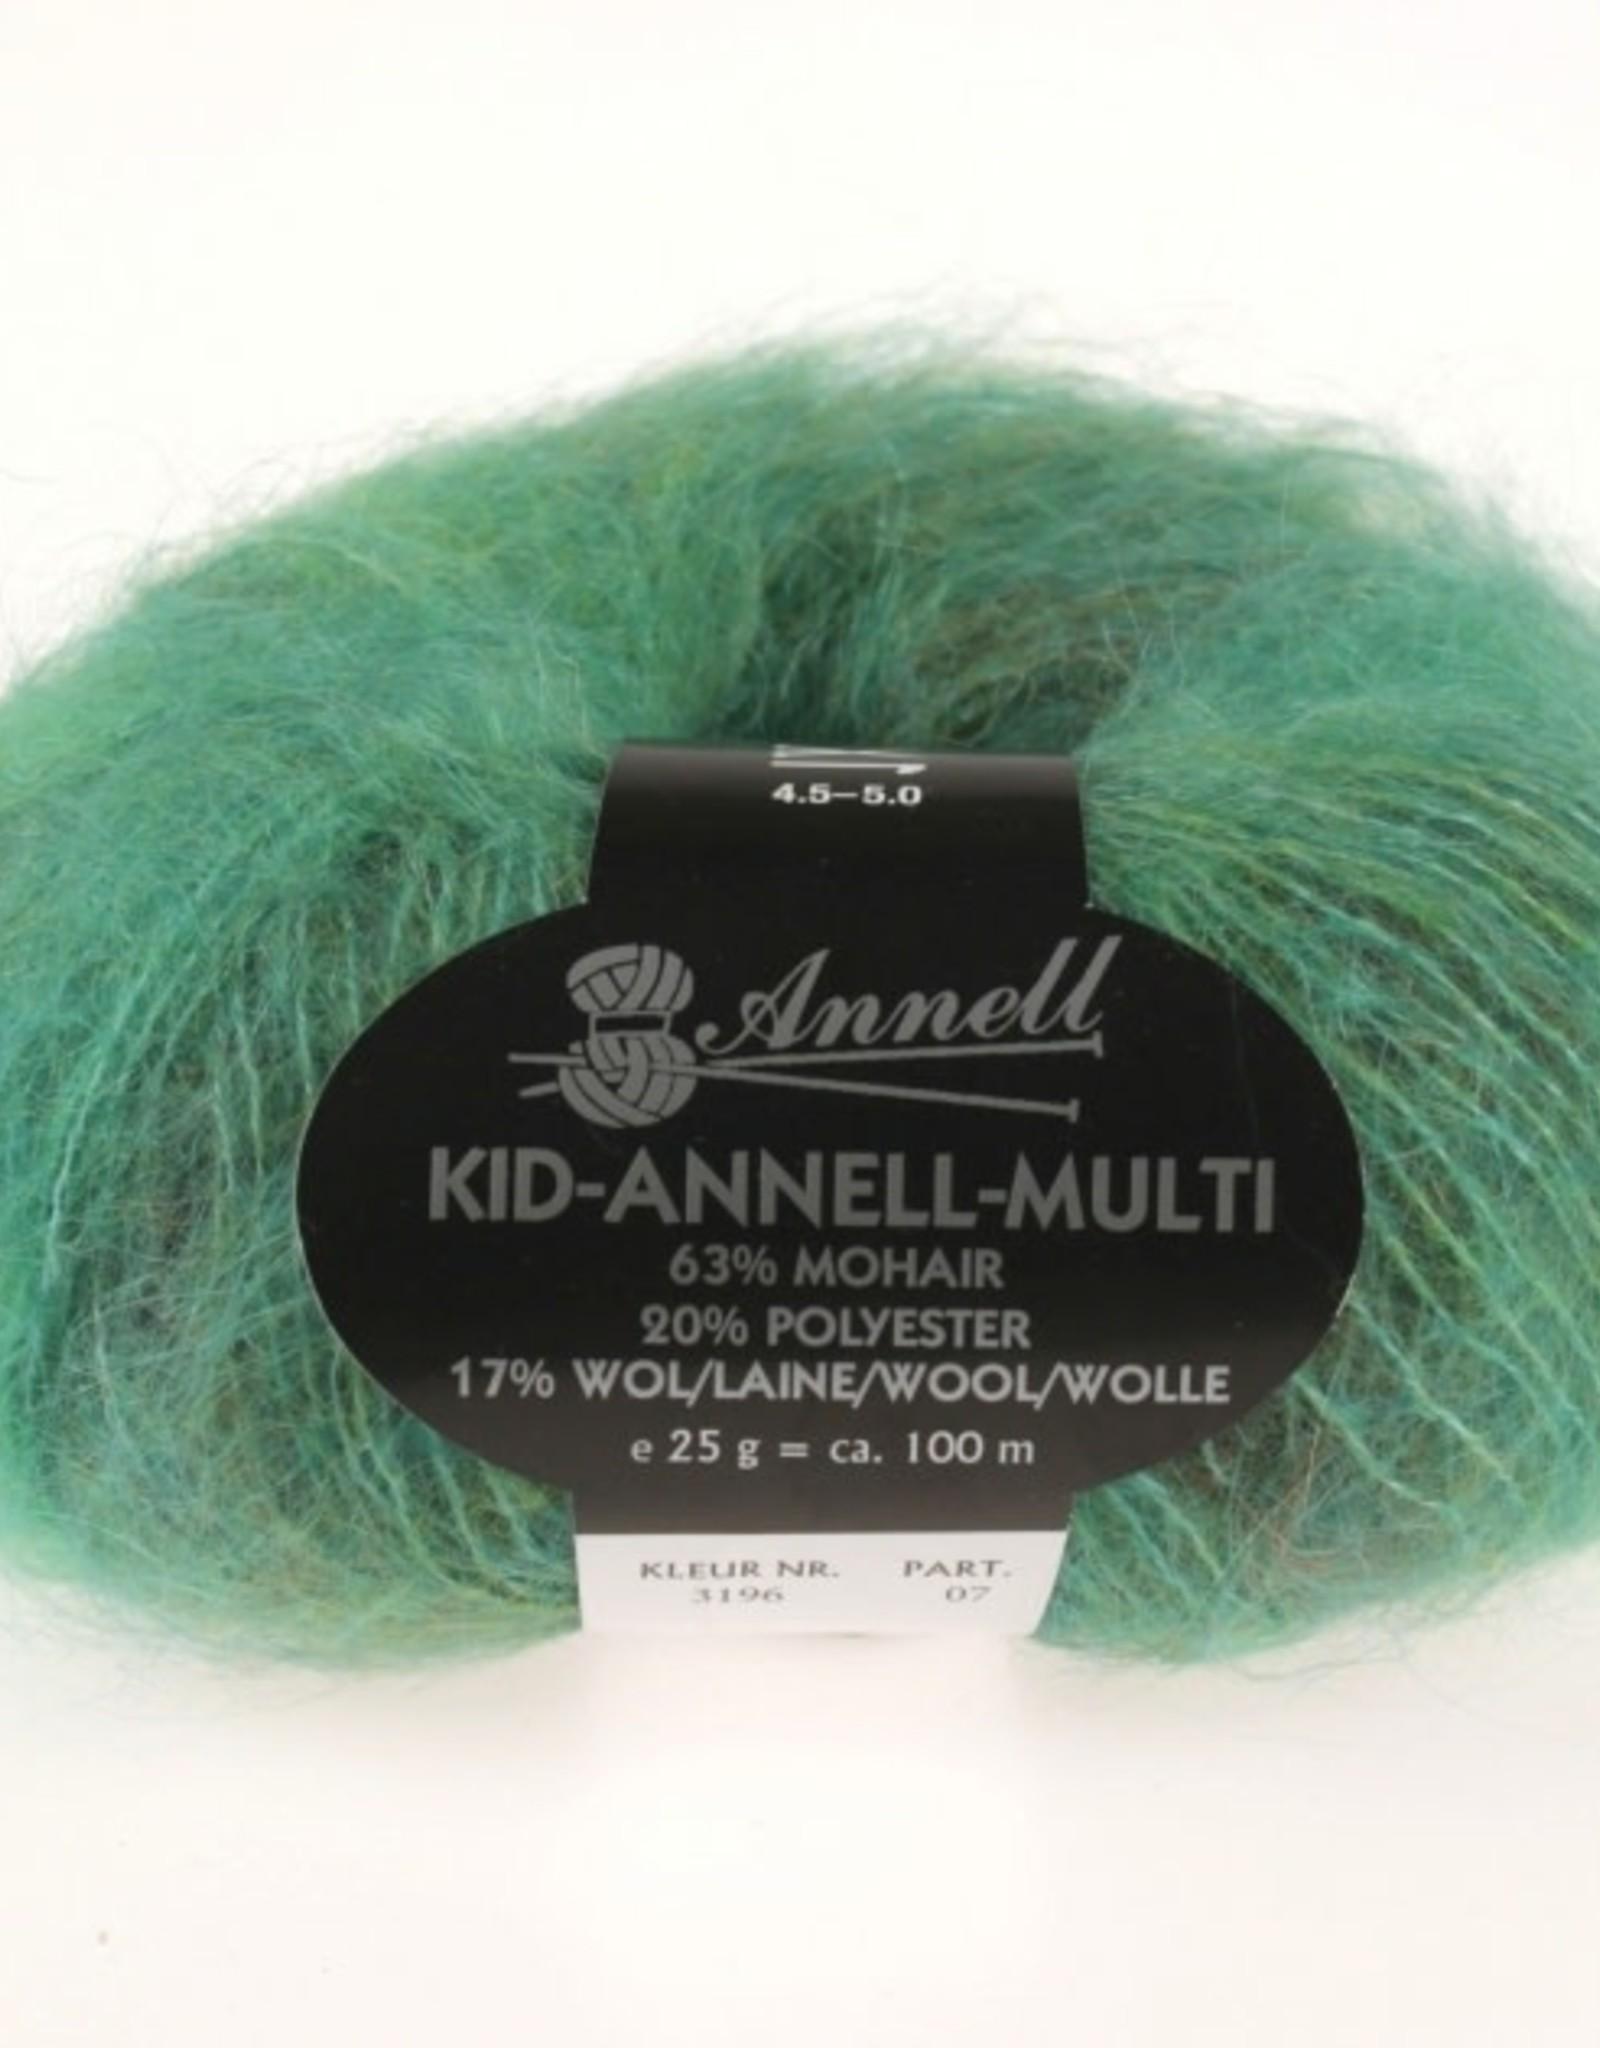 Annell Annell Kid Annell multi 3196